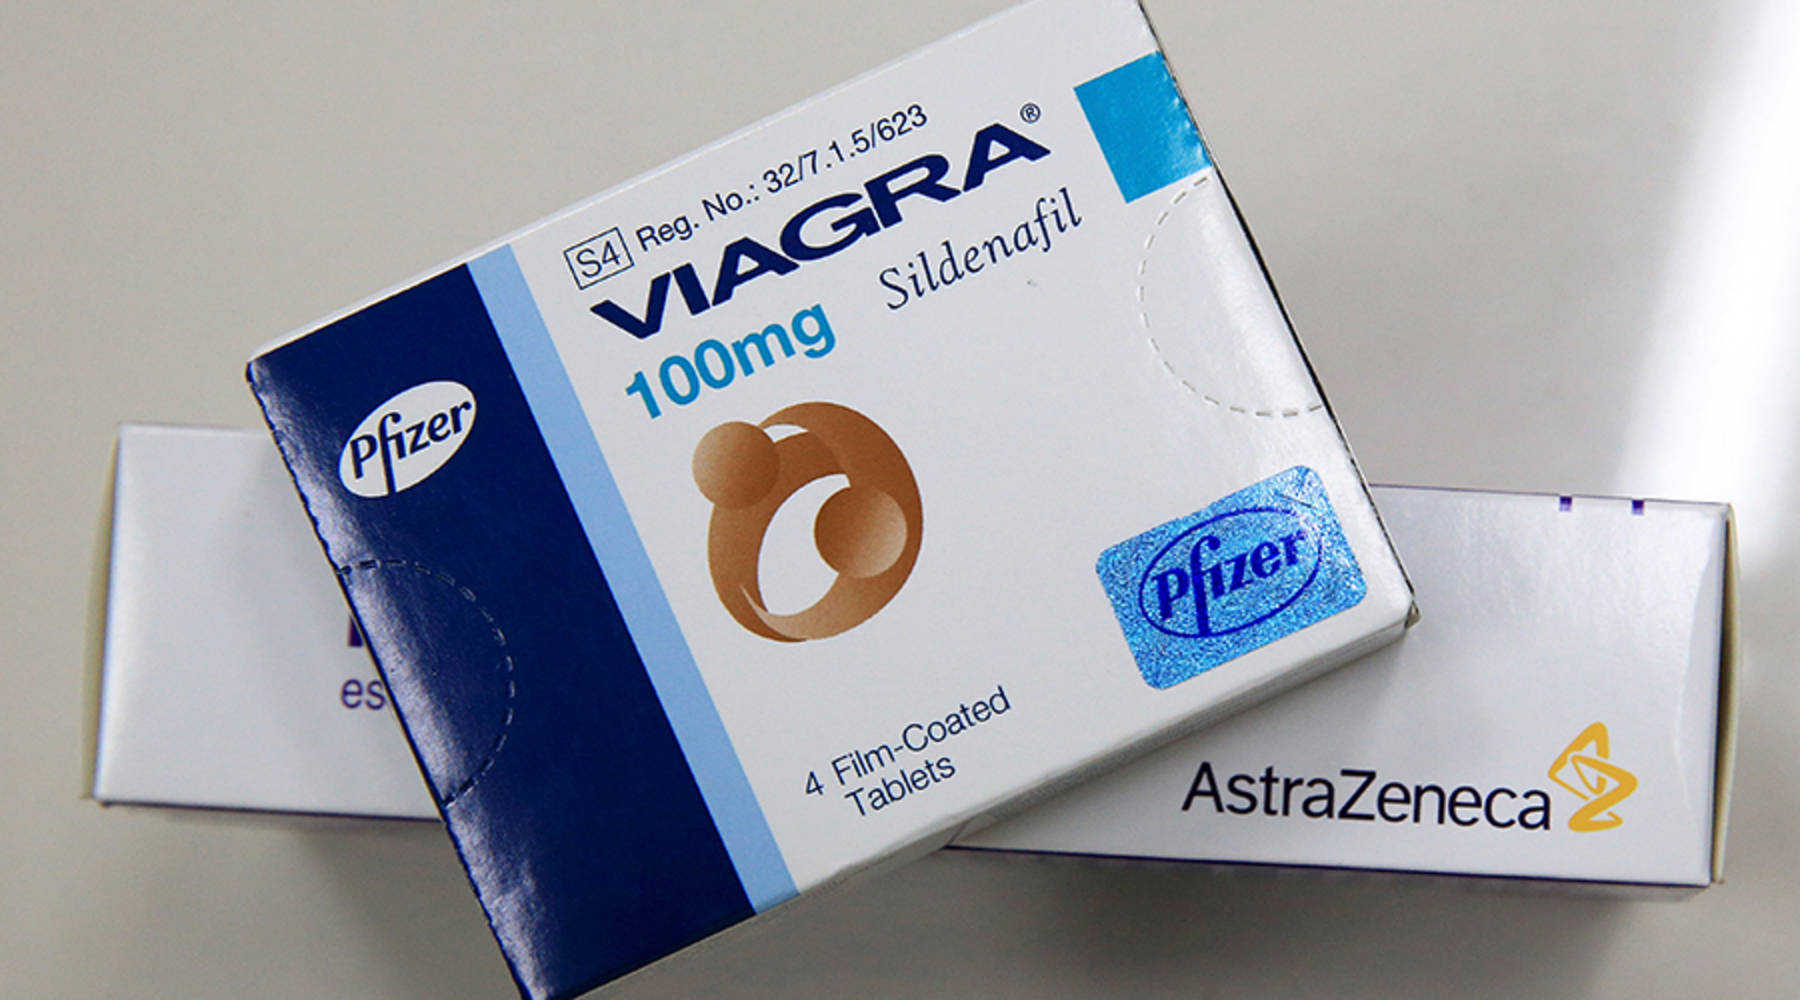 Generic Viagra floods the market  Here's how Pfizer is